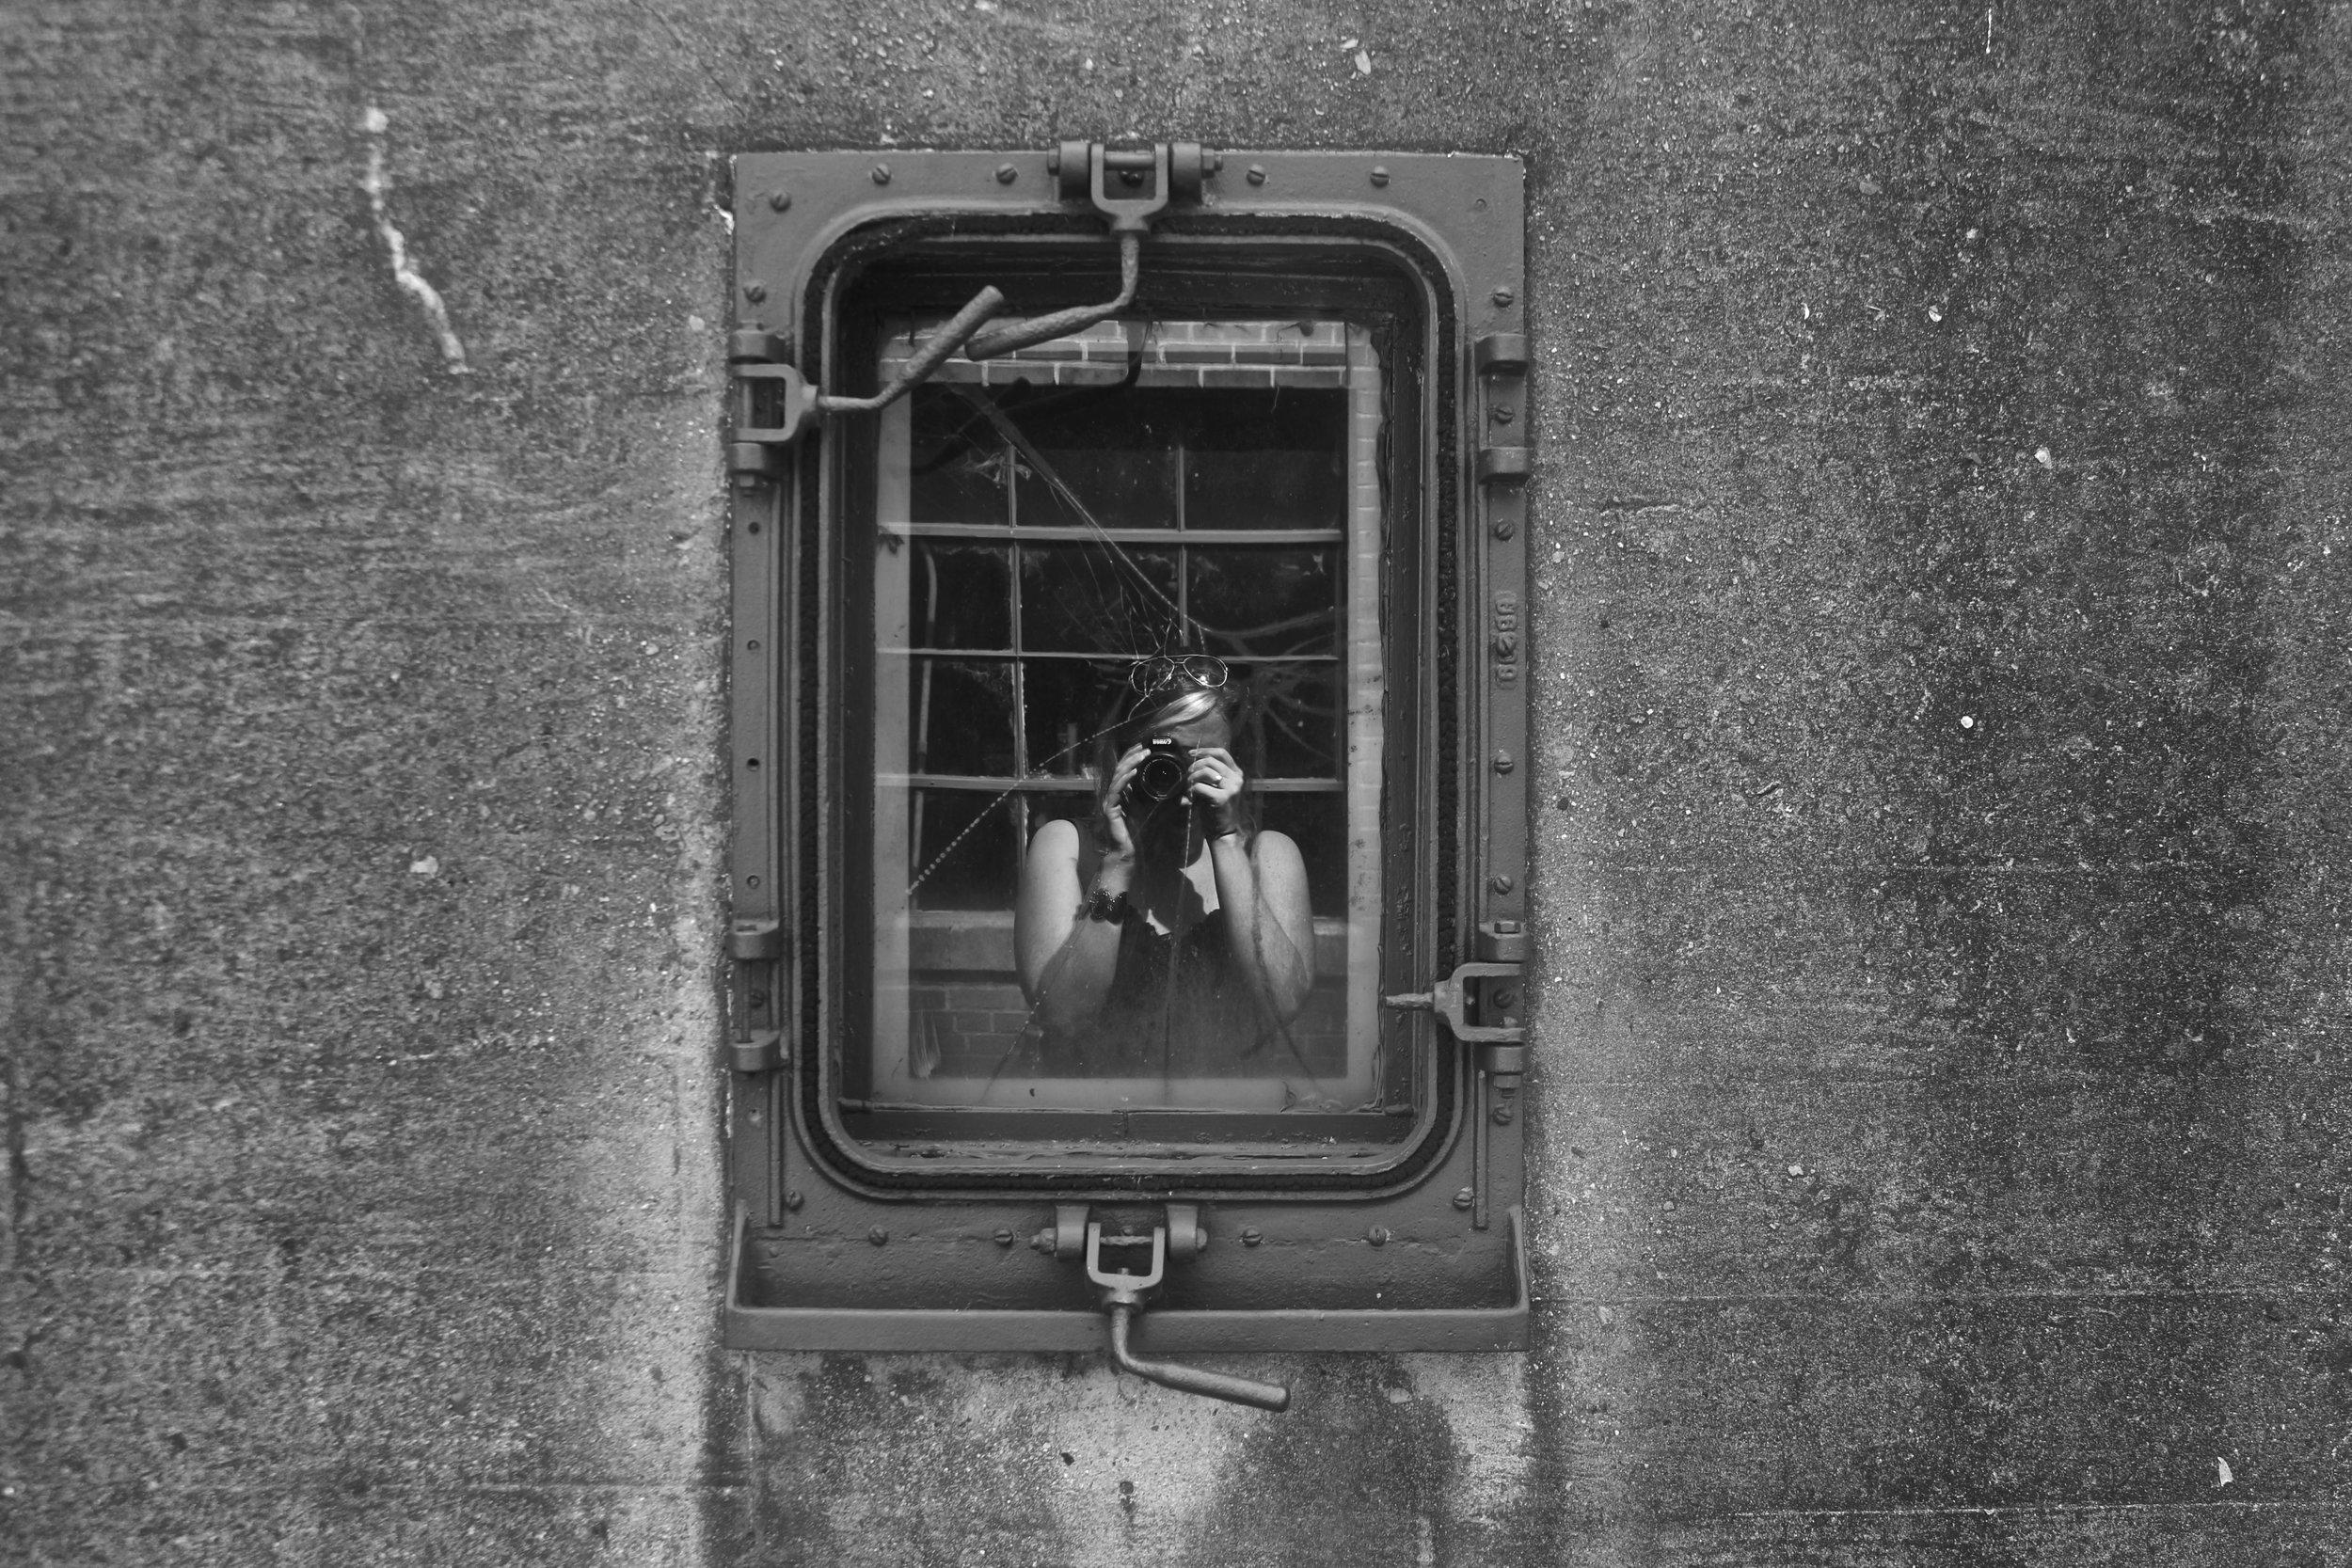 Self portrait at Sloss Furnace